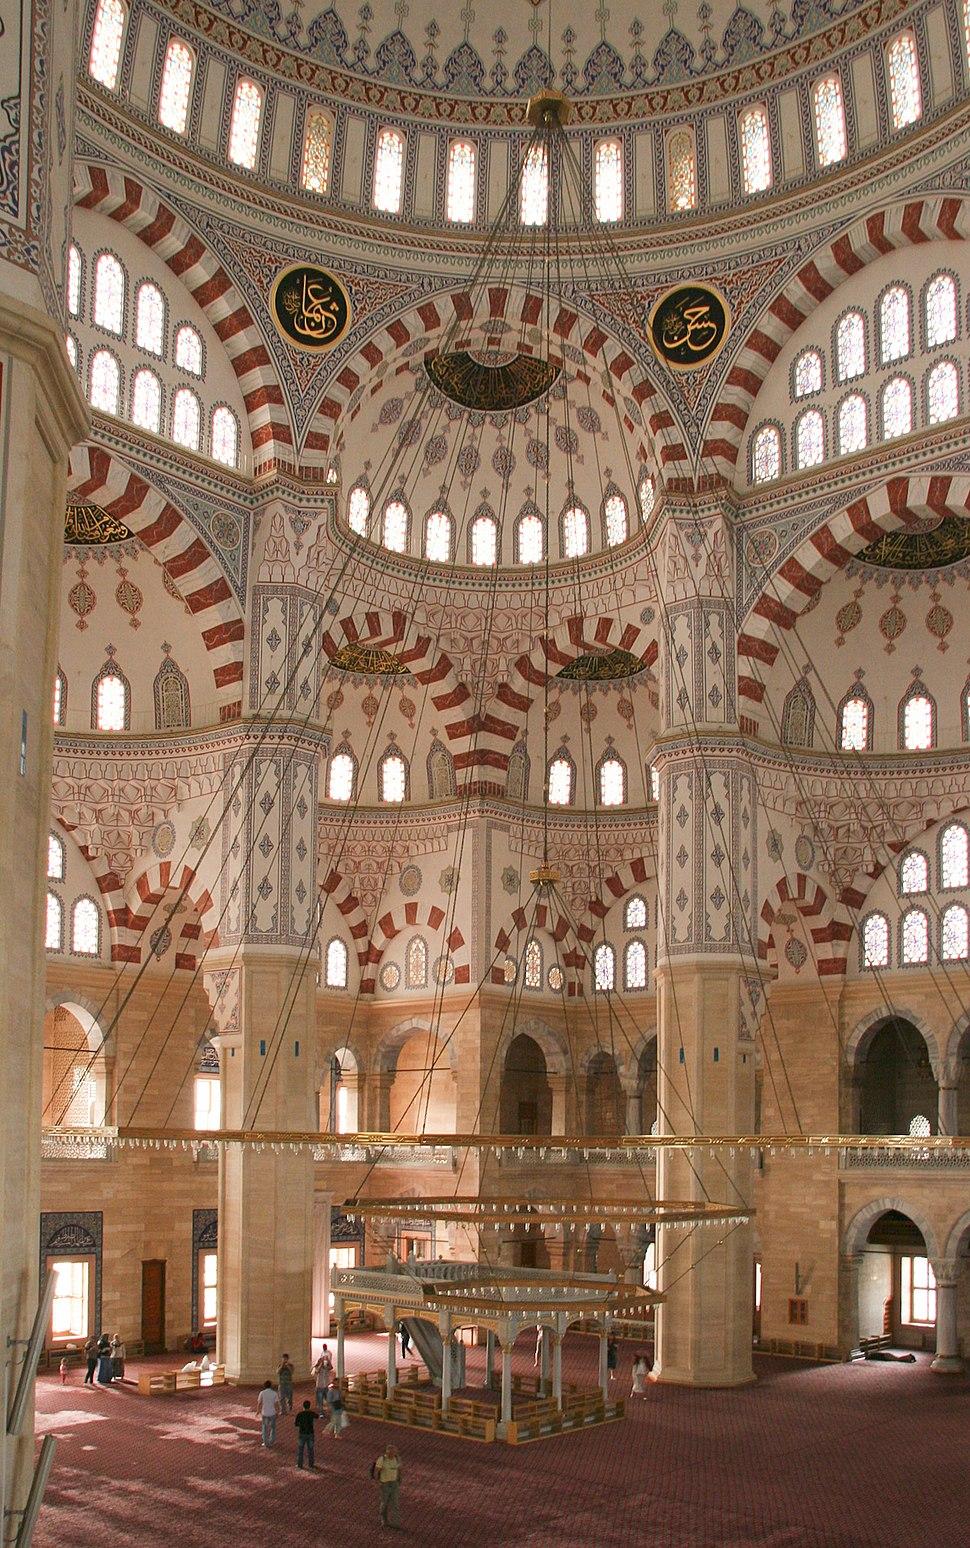 Sabanc%C4%B1 Central Mosque - Adana